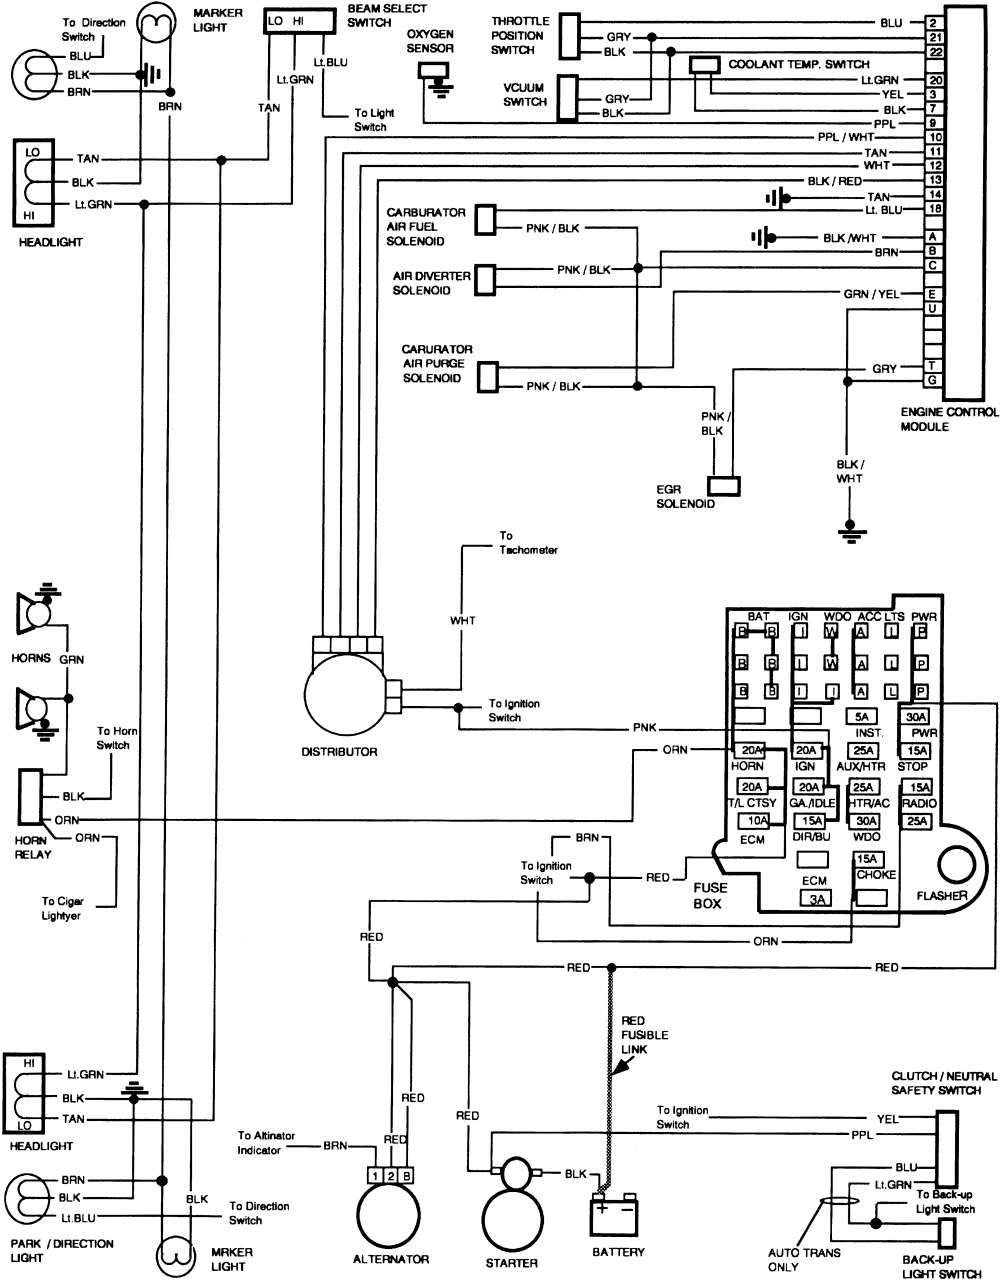 hight resolution of wiring diagram cars trucks wiring diagram cars trucks truck horn 1986 chevy truck horn wiring diagram chevy truck horn wiring